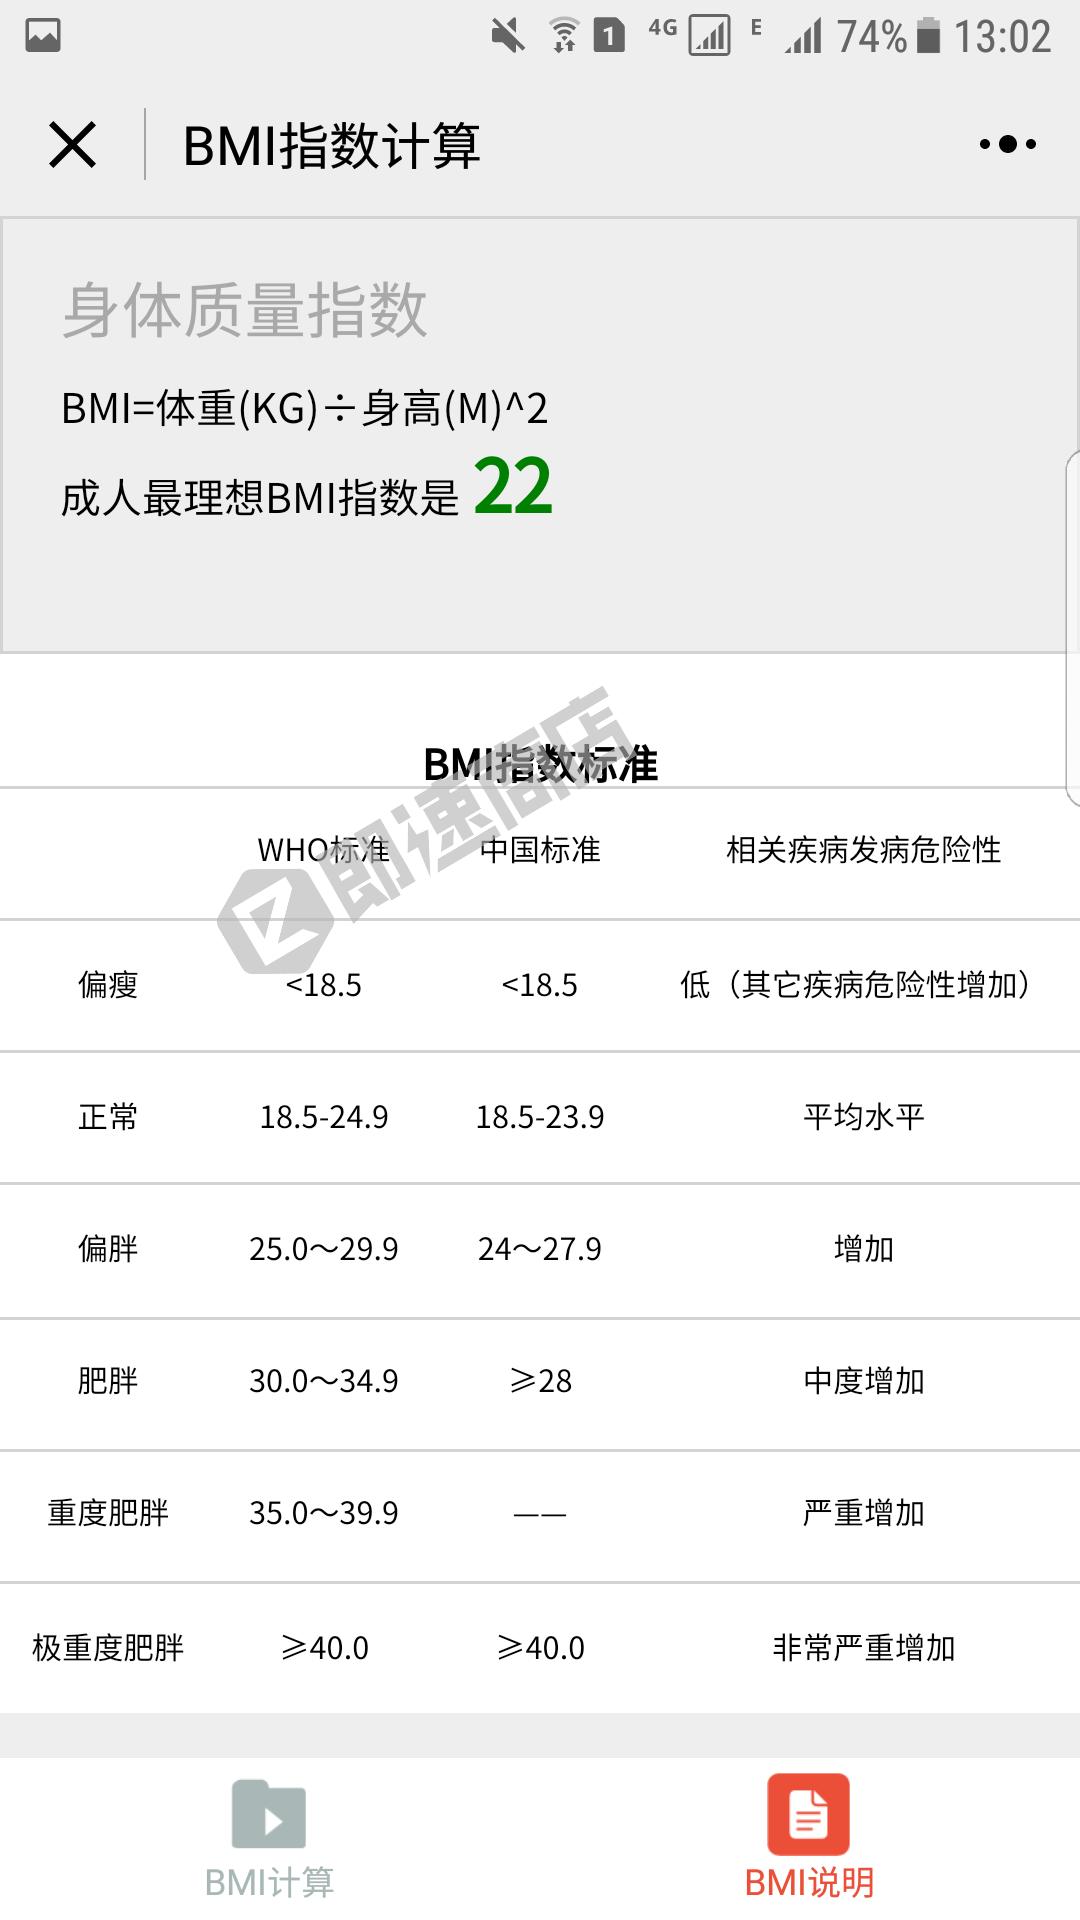 BMI指数计算小程序详情页截图